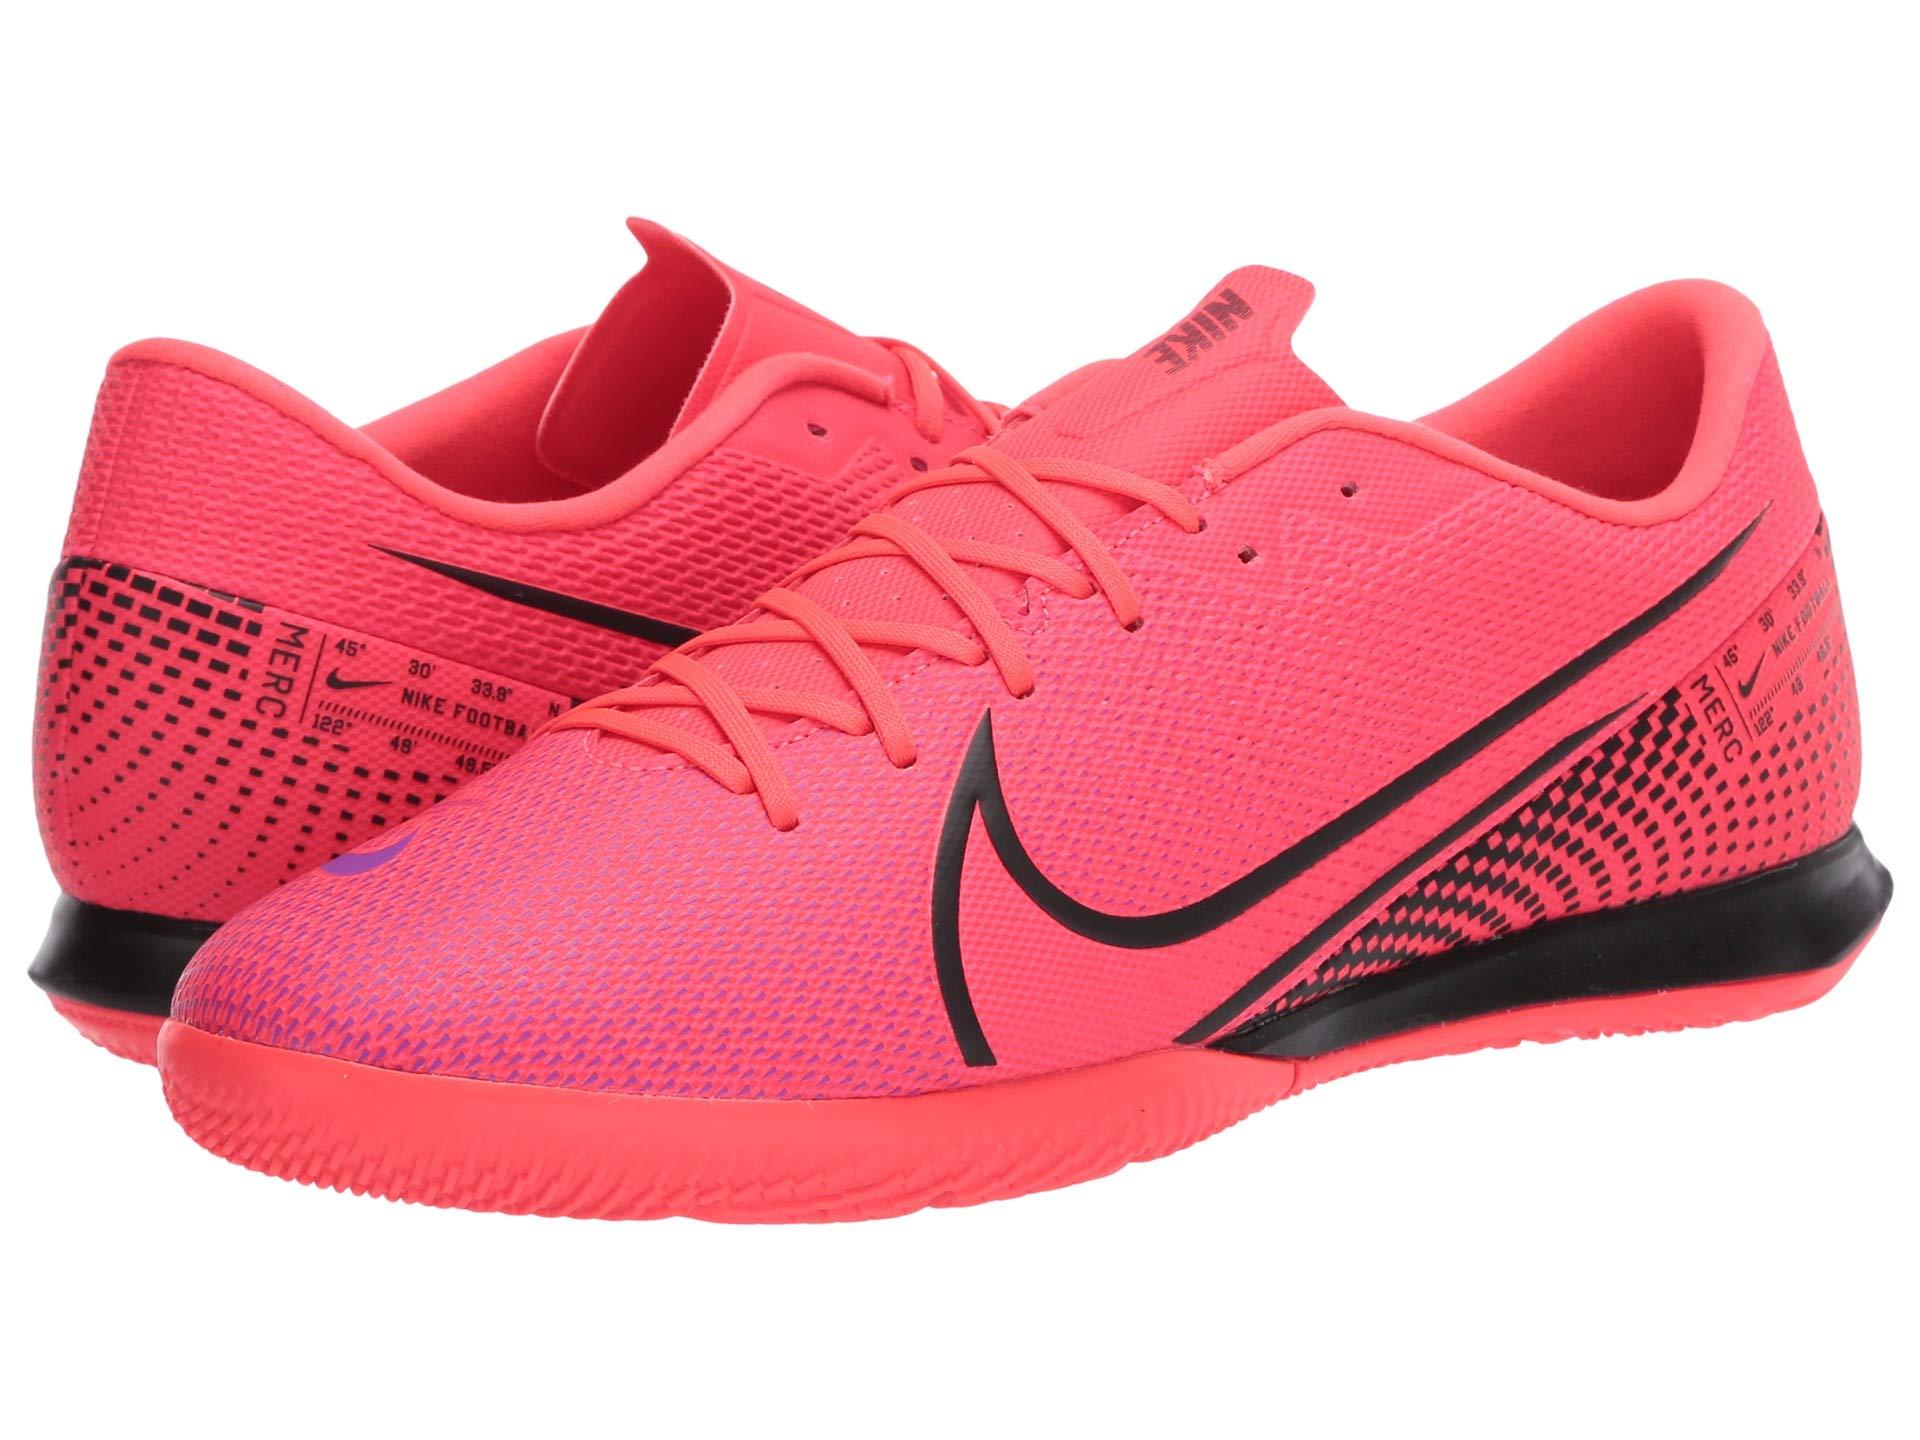 Nike Nike Vapor 13 Academy IC